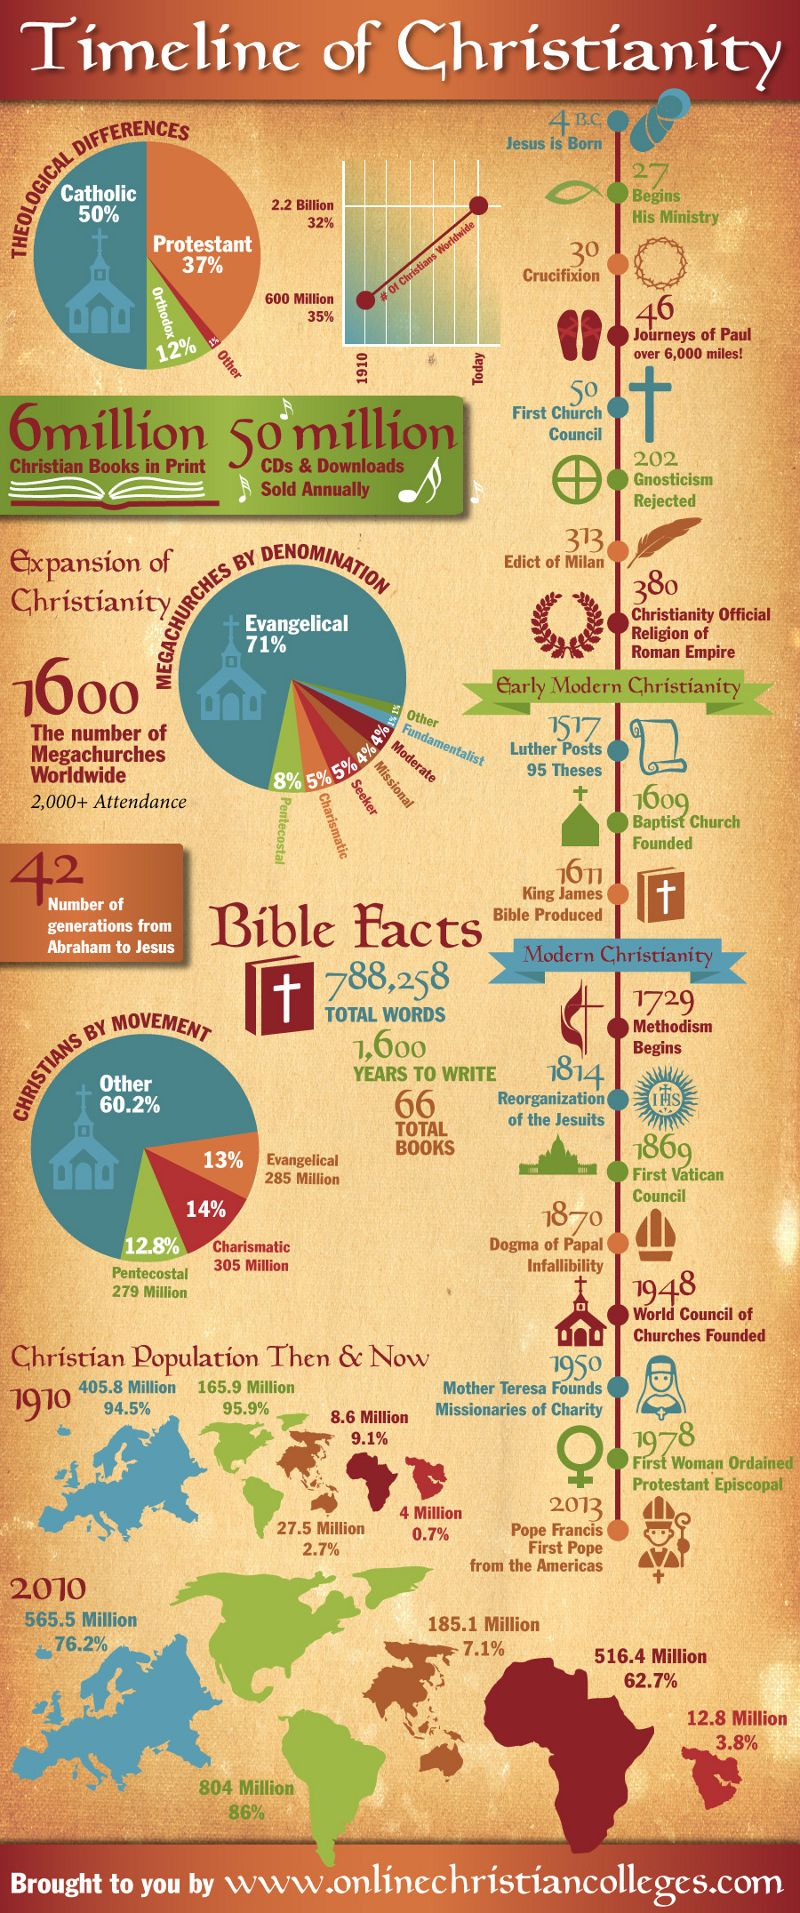 101 cool christian team names | psr ideas | pinterest | christianity